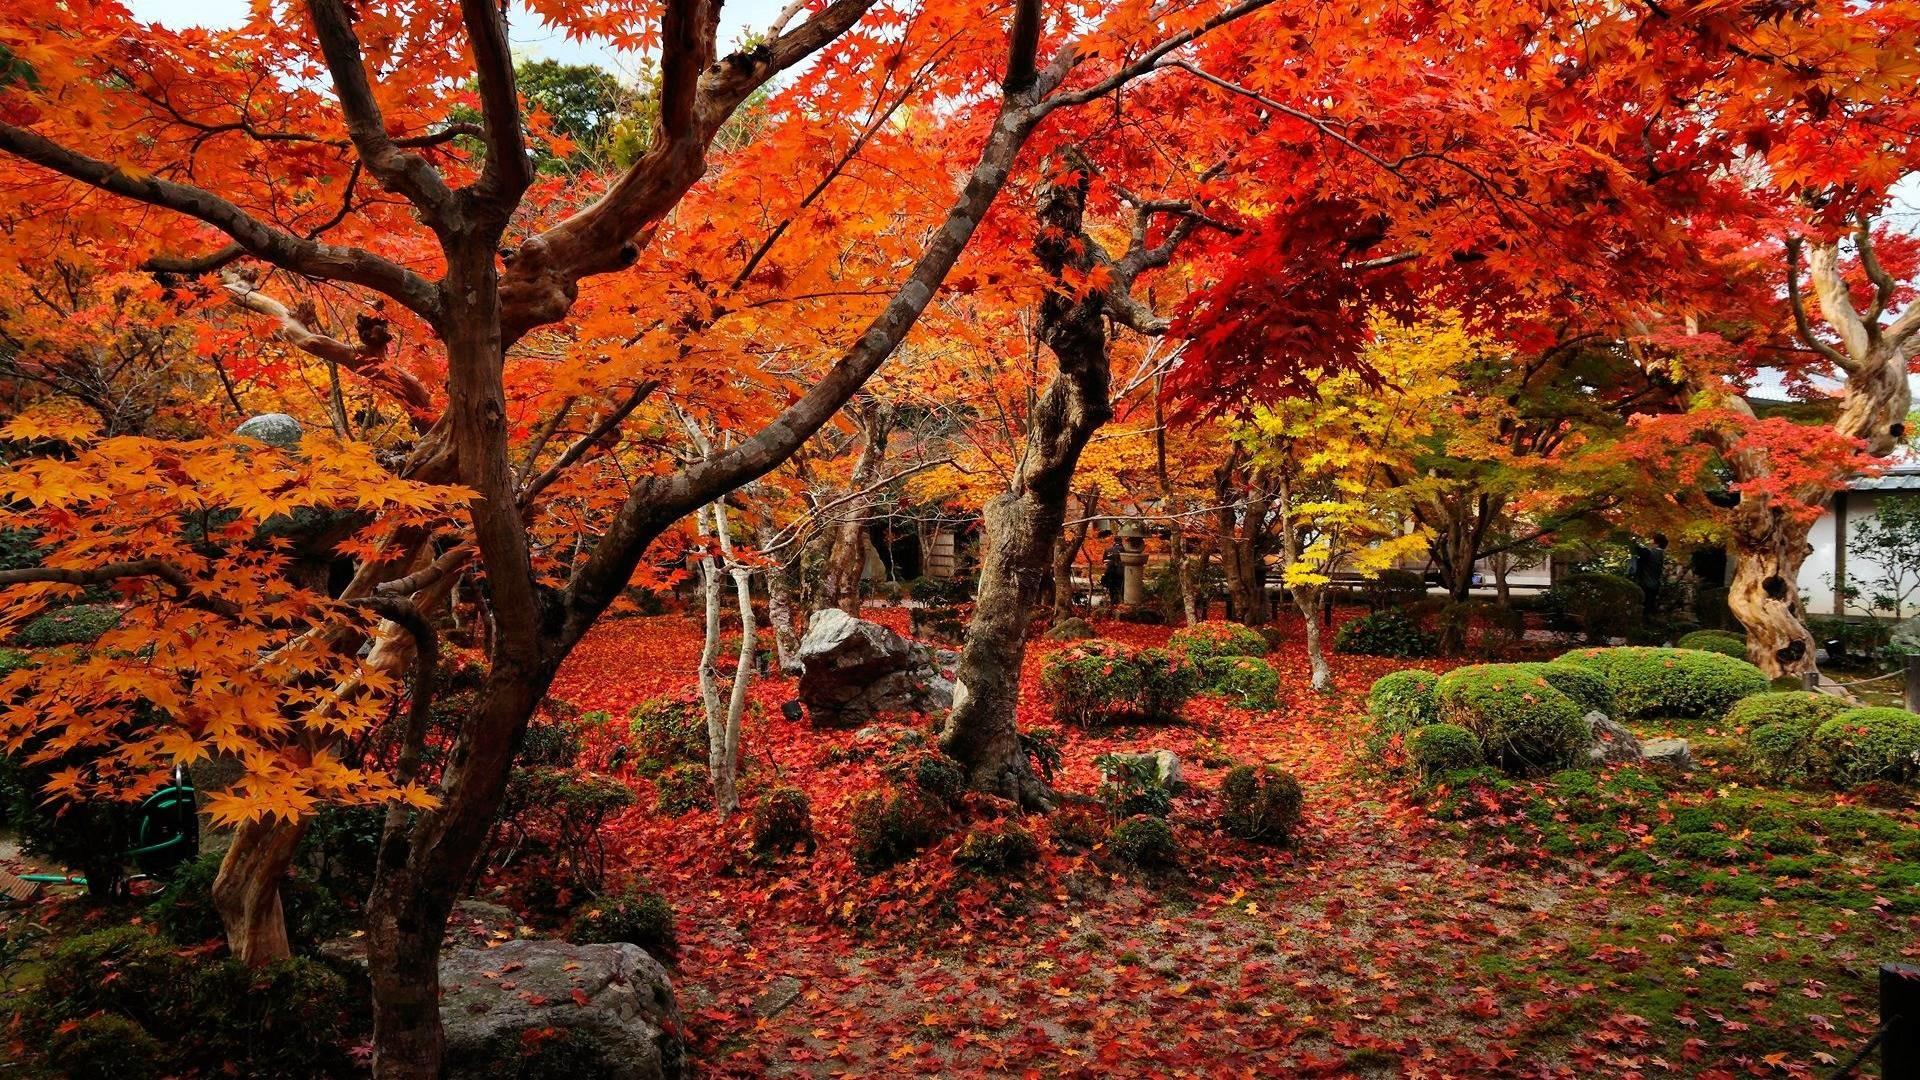 … autumn wallpapers wallpaper cave …